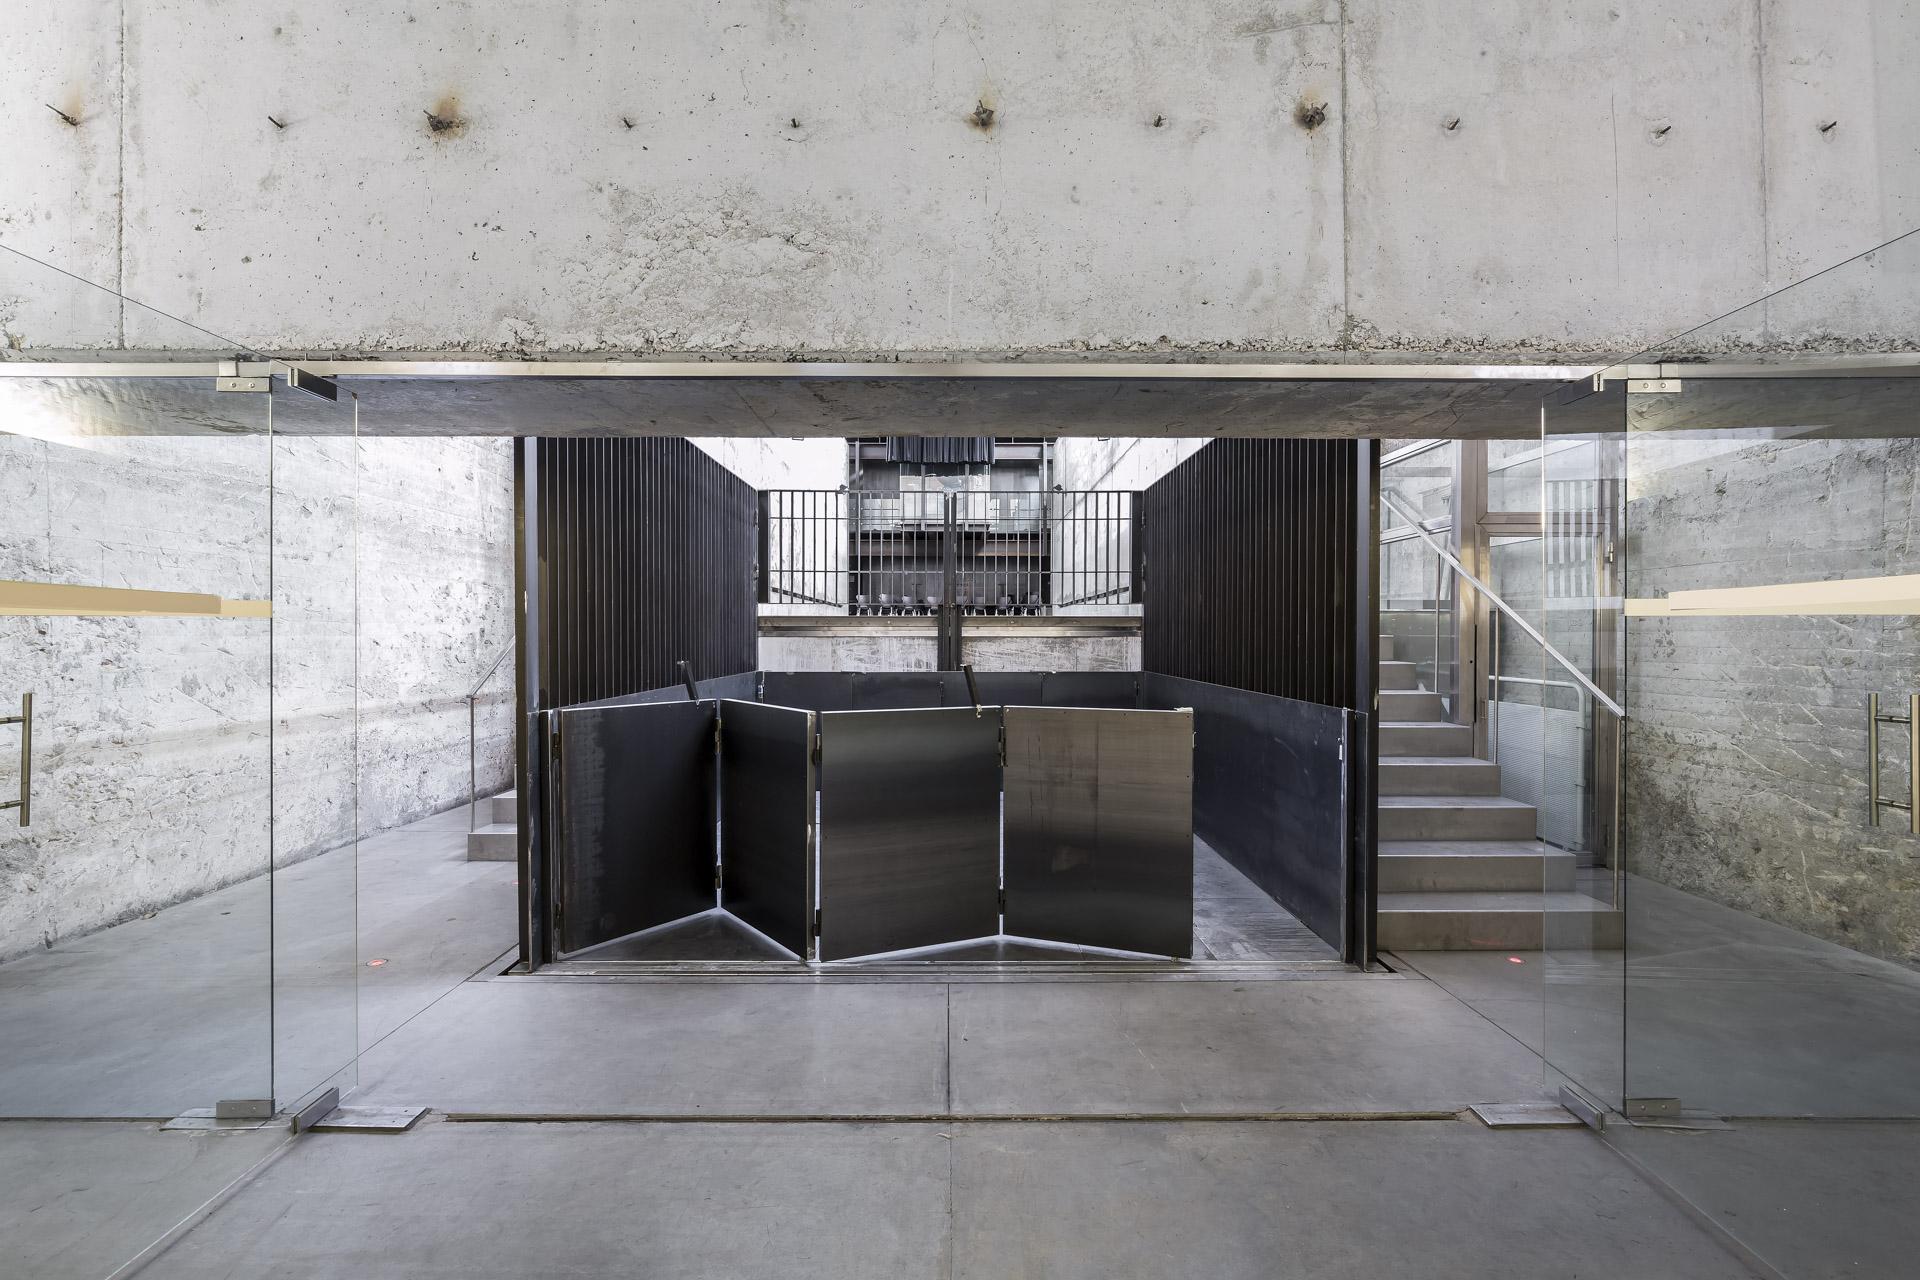 fotografia-arquitectura-madrid-nuevos-ministerios-elorza-german-cabo-16